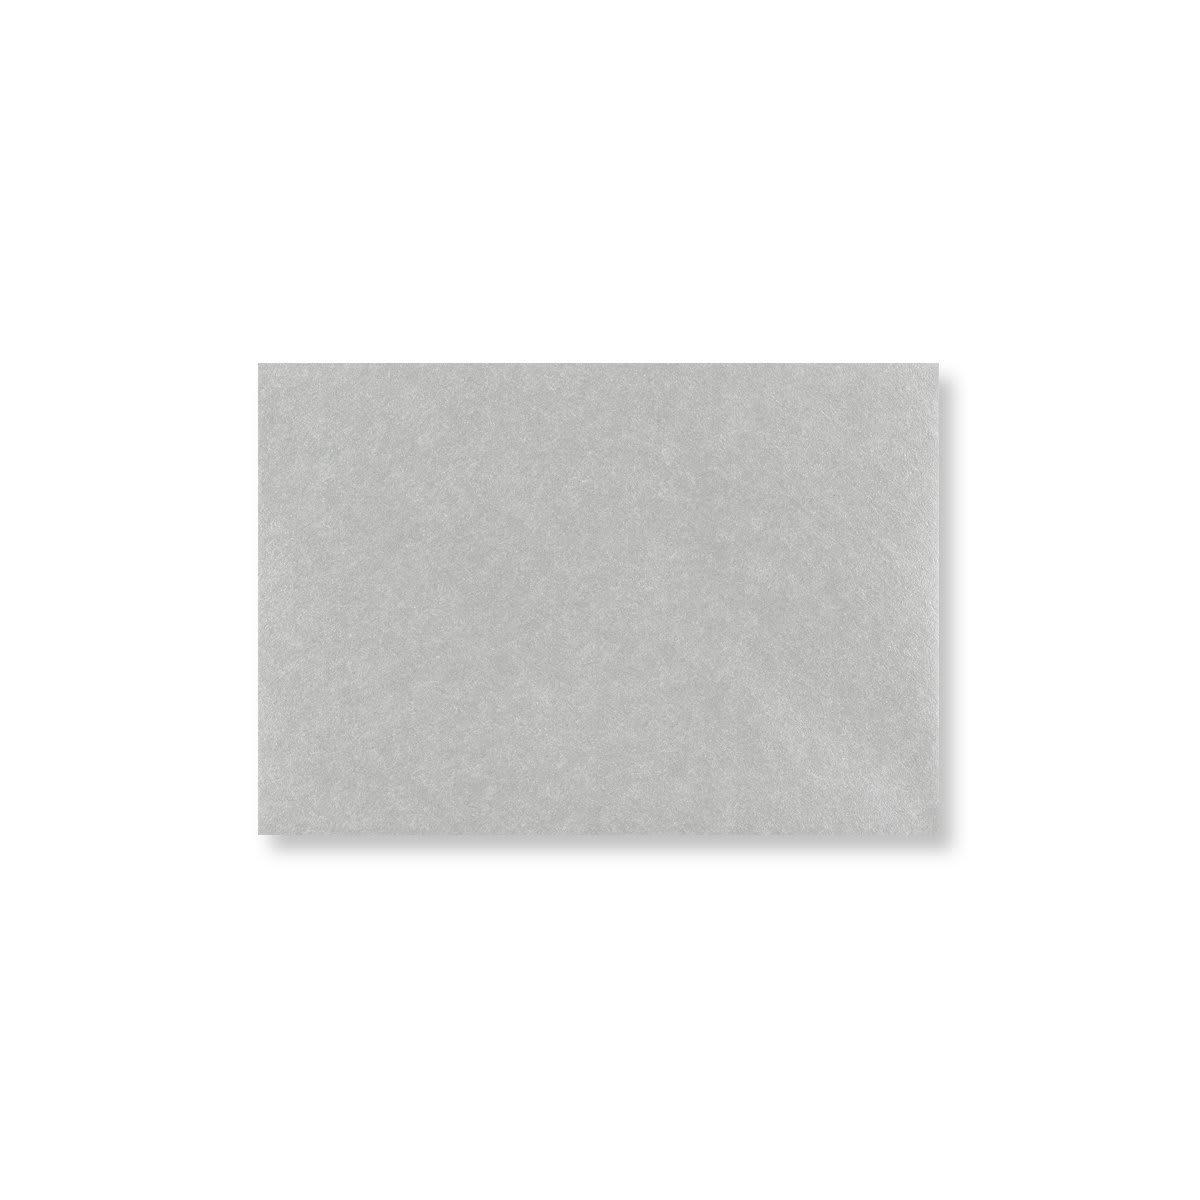 METALLIC SILVER 70 x 100 mm GIFT TAG ENVELOPE (i2)